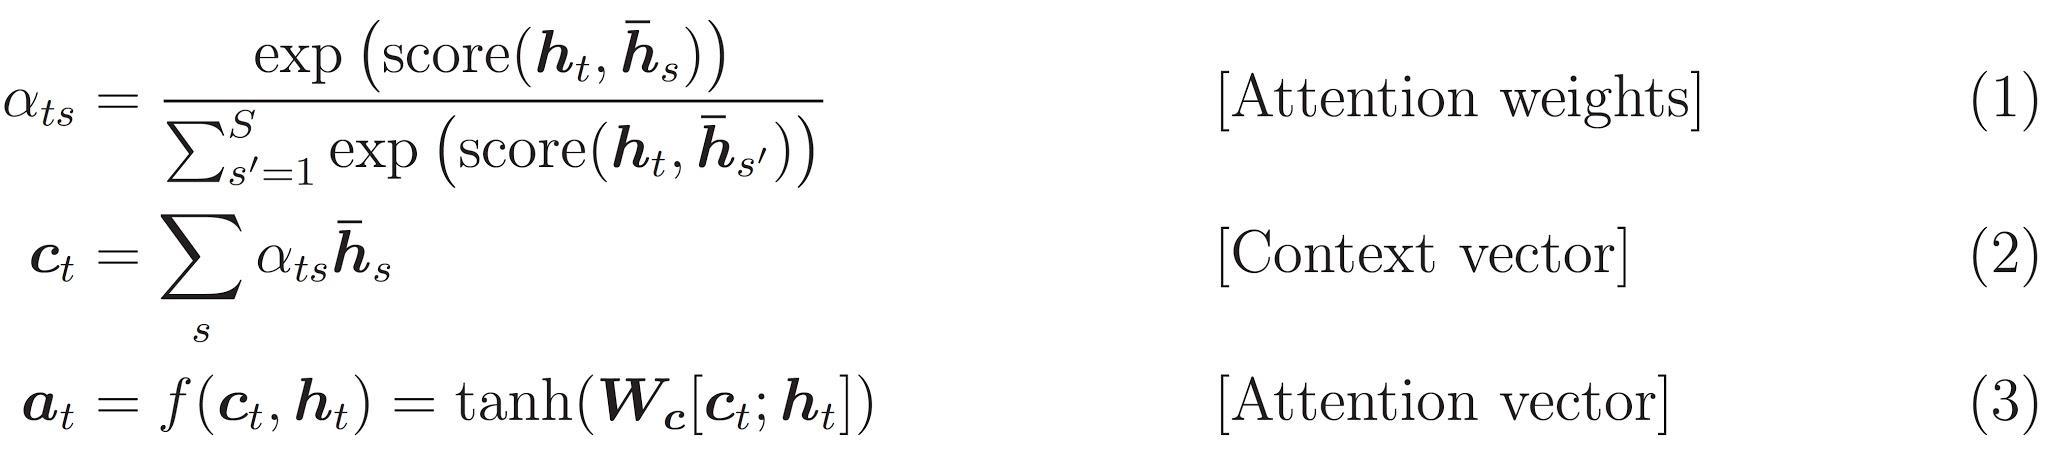 attention equation 0